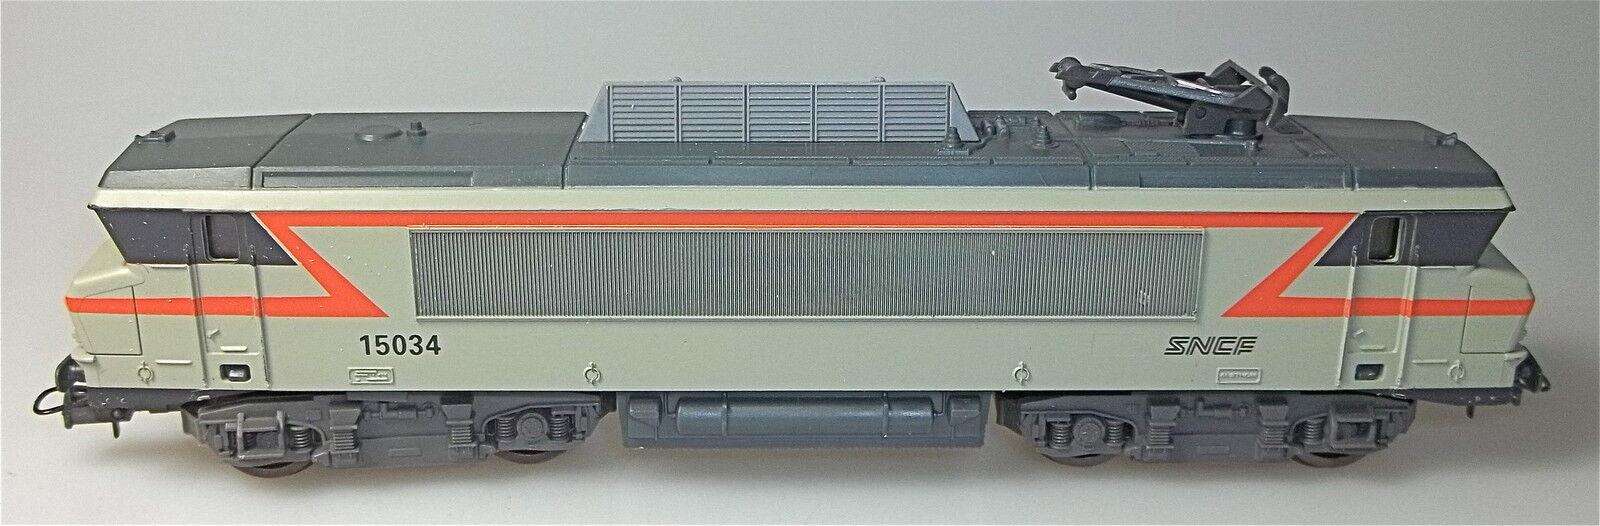 SNCF 15034 Elektrolok Jouef Lima H0 1 87 ohne OVP neuwertig unbenutzt LB6 µ